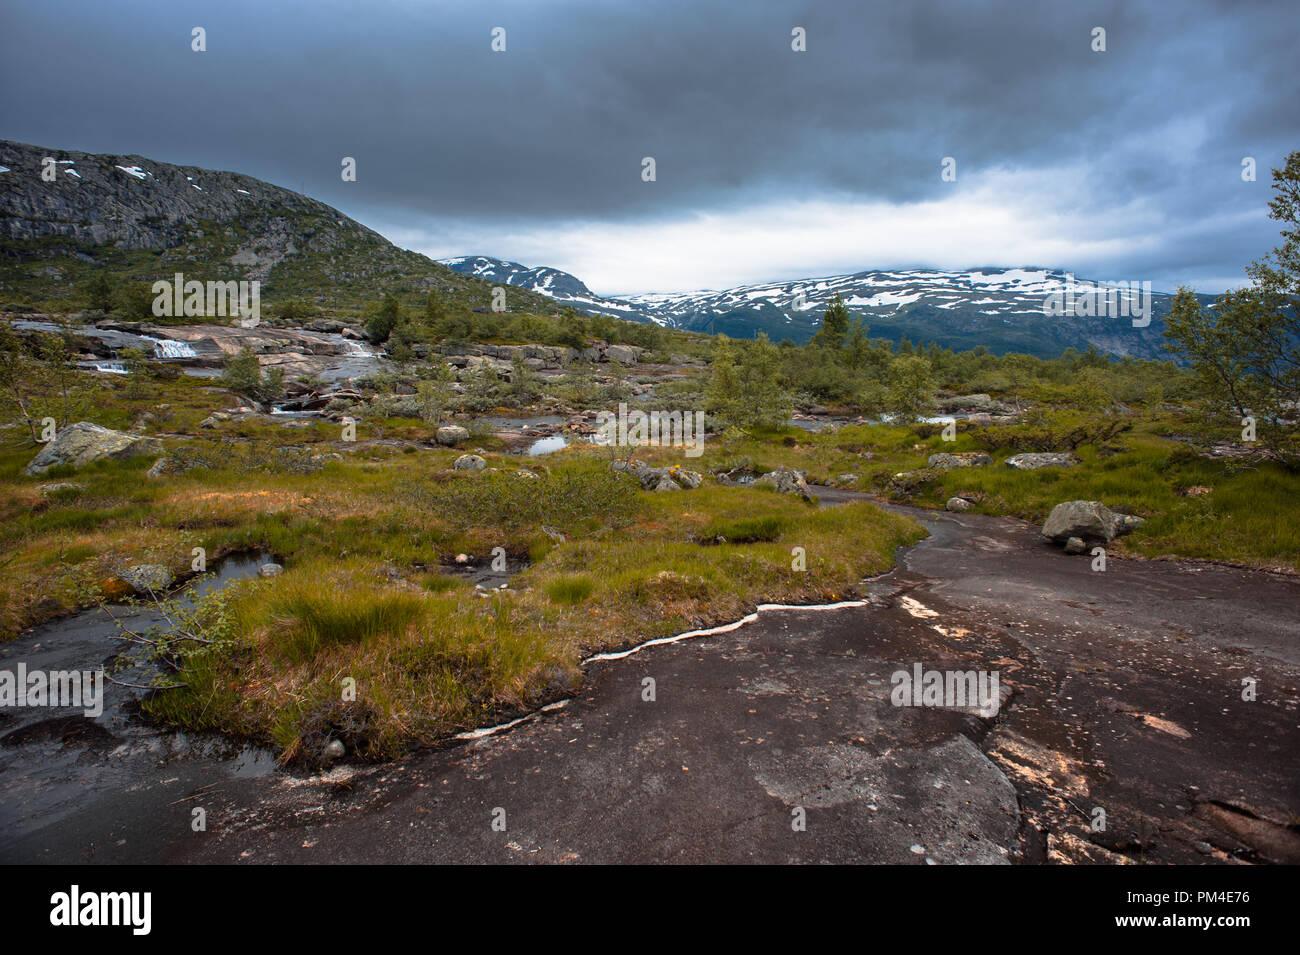 The summer view of Trolltunga in Odda, Ringedalsvatnet lake, Norway. - Stock Image